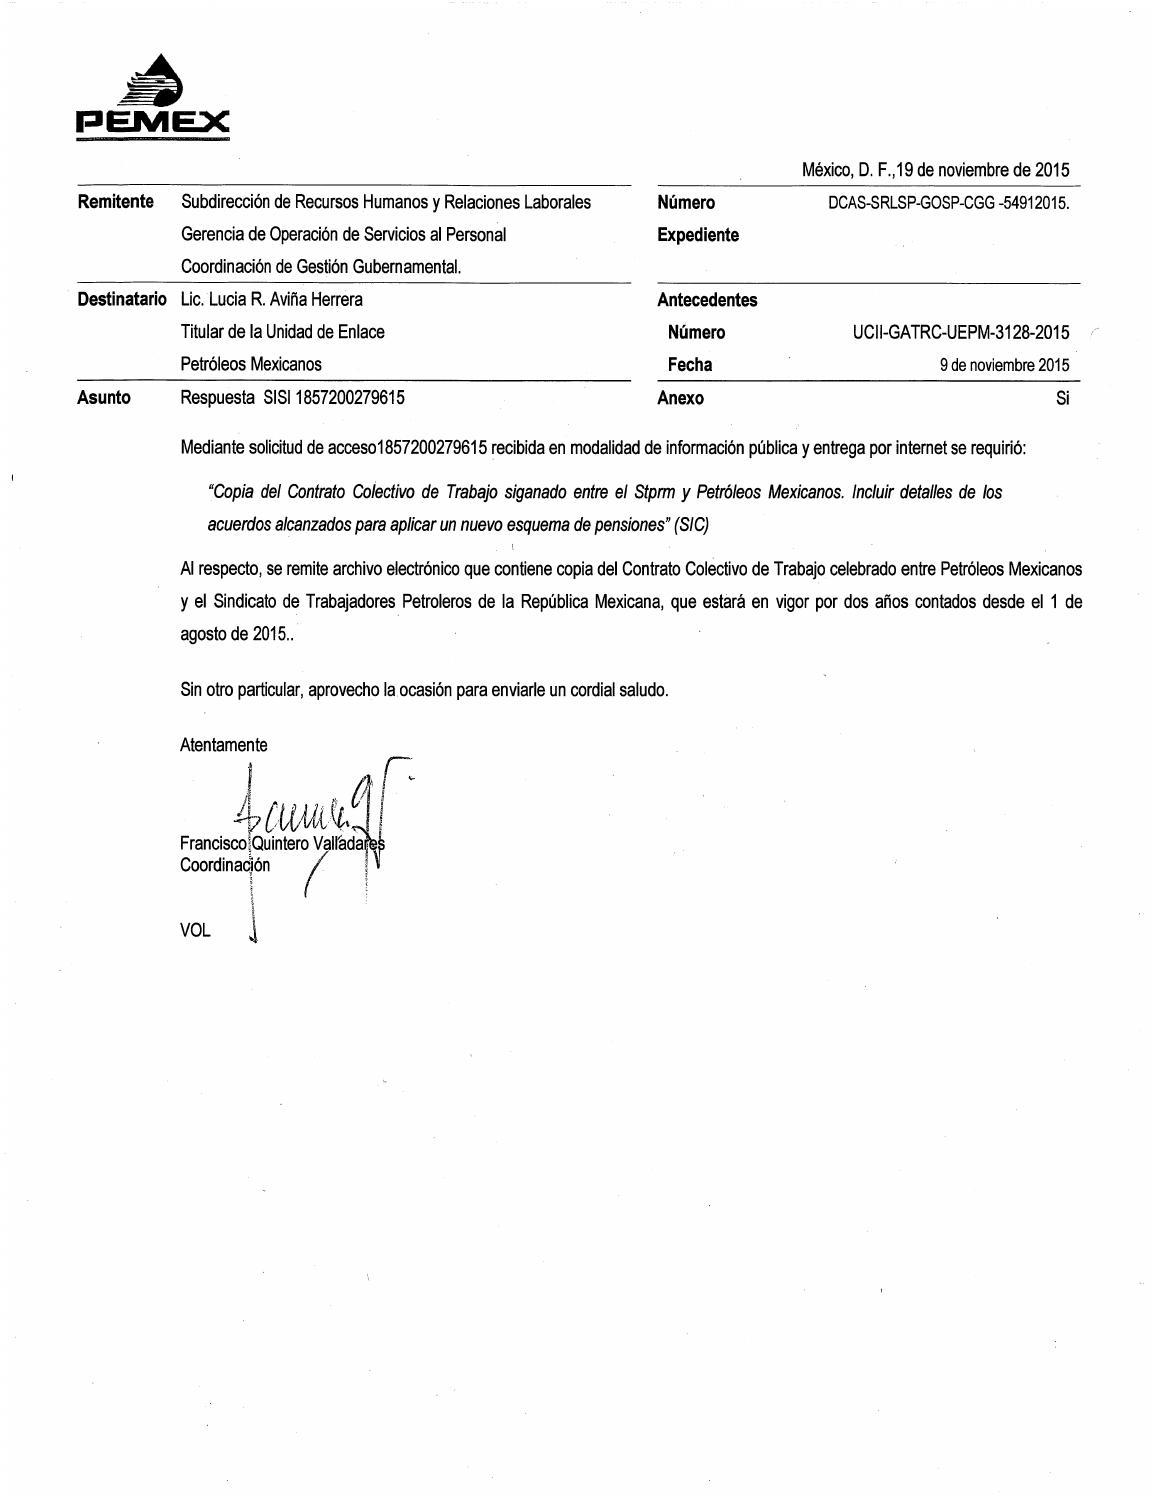 CCT Pemex-Stprm 2015-2017 by COCKTELERA - issuu